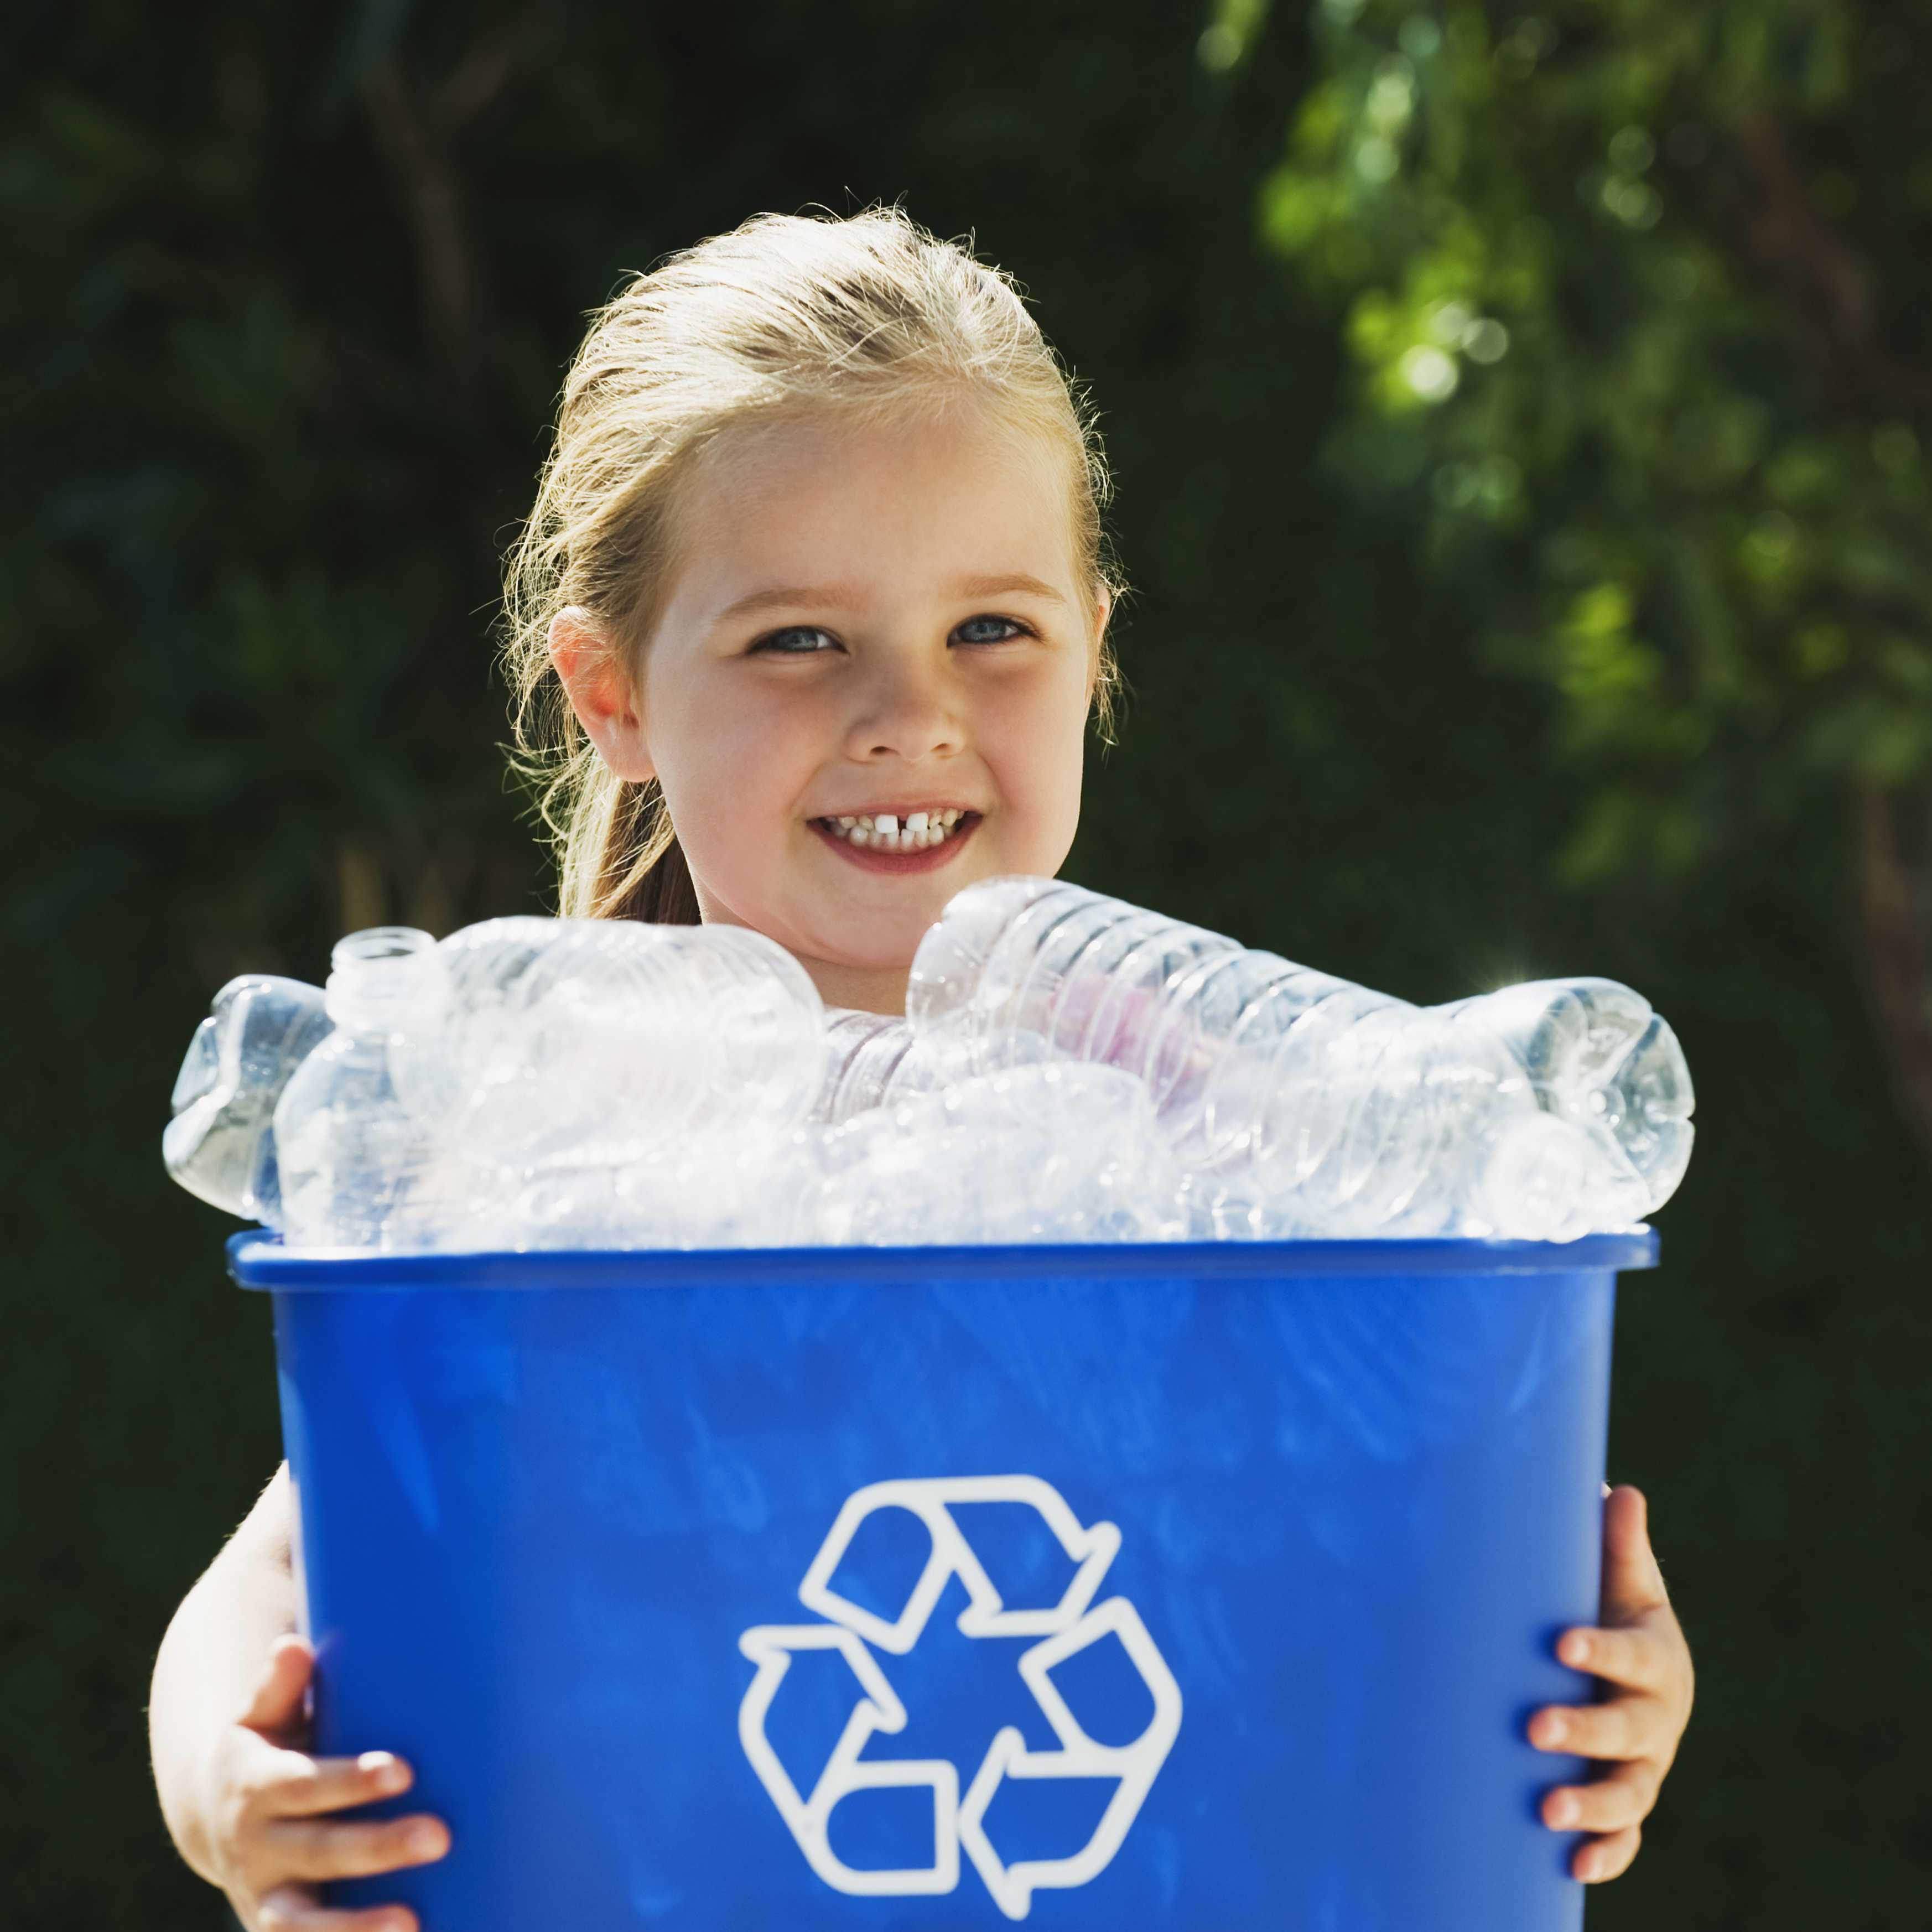 Little Girl Holding Recycling Bin.jpg